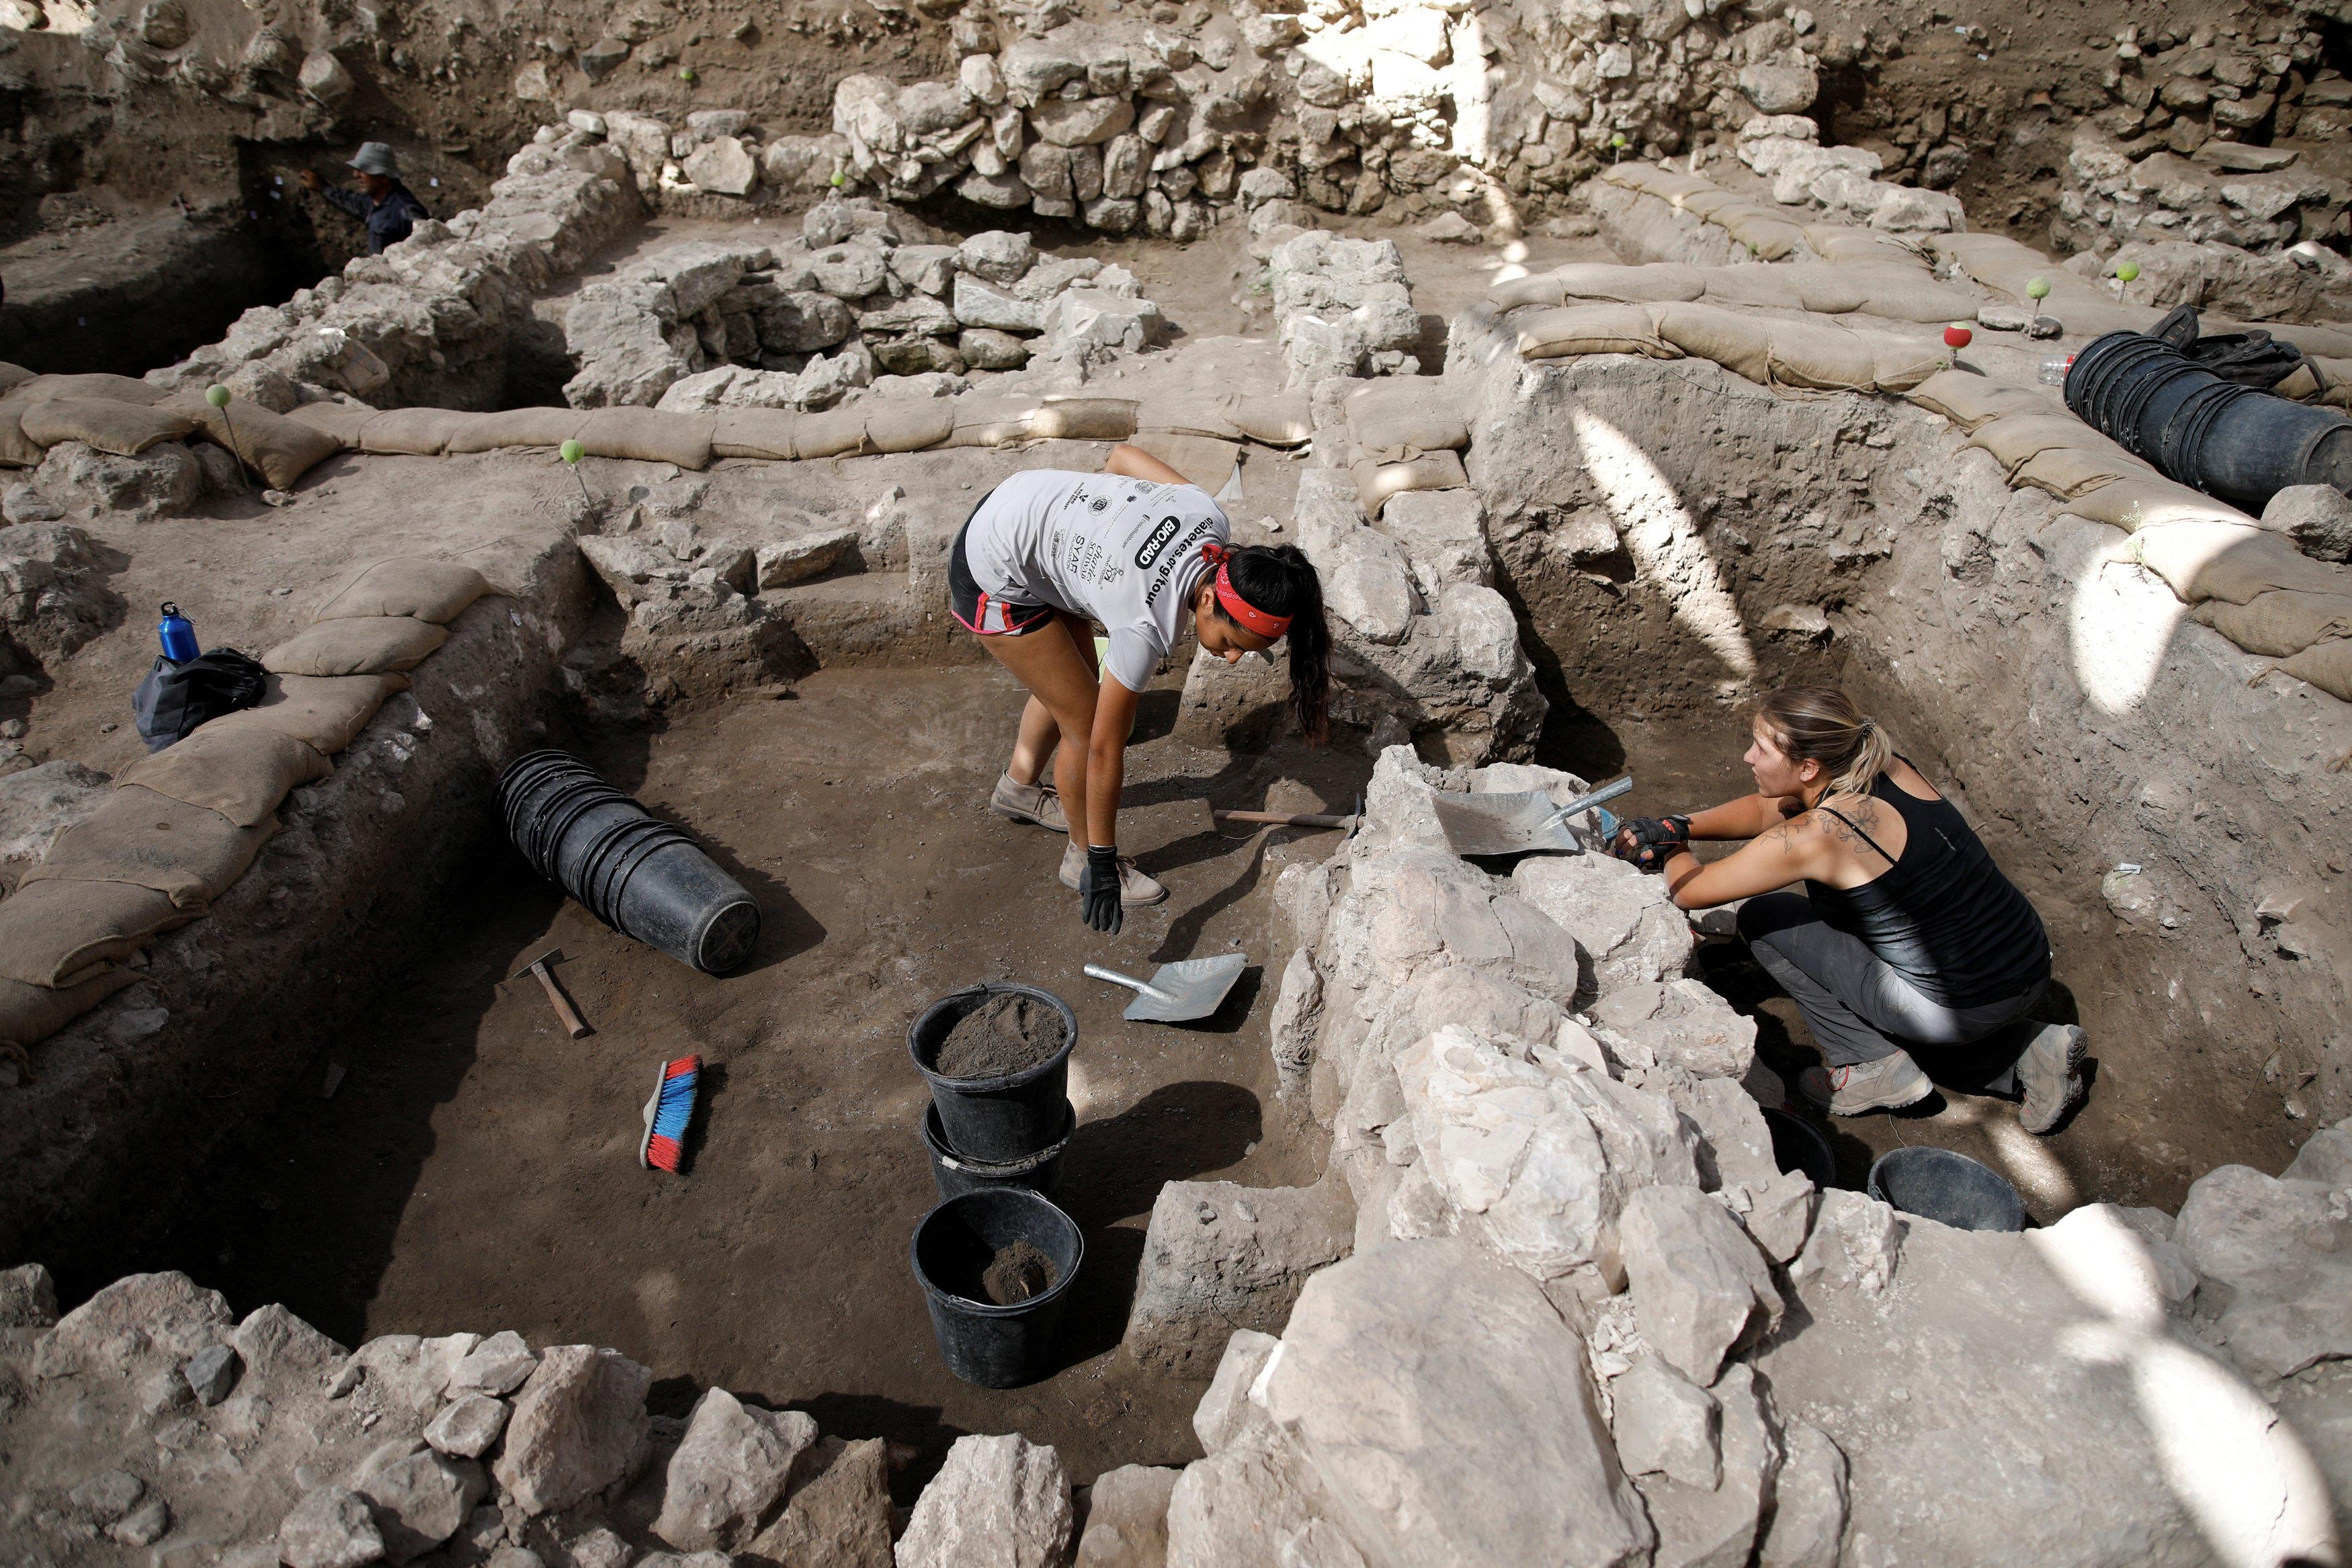 Meggido excavation (Photo: Reuters)